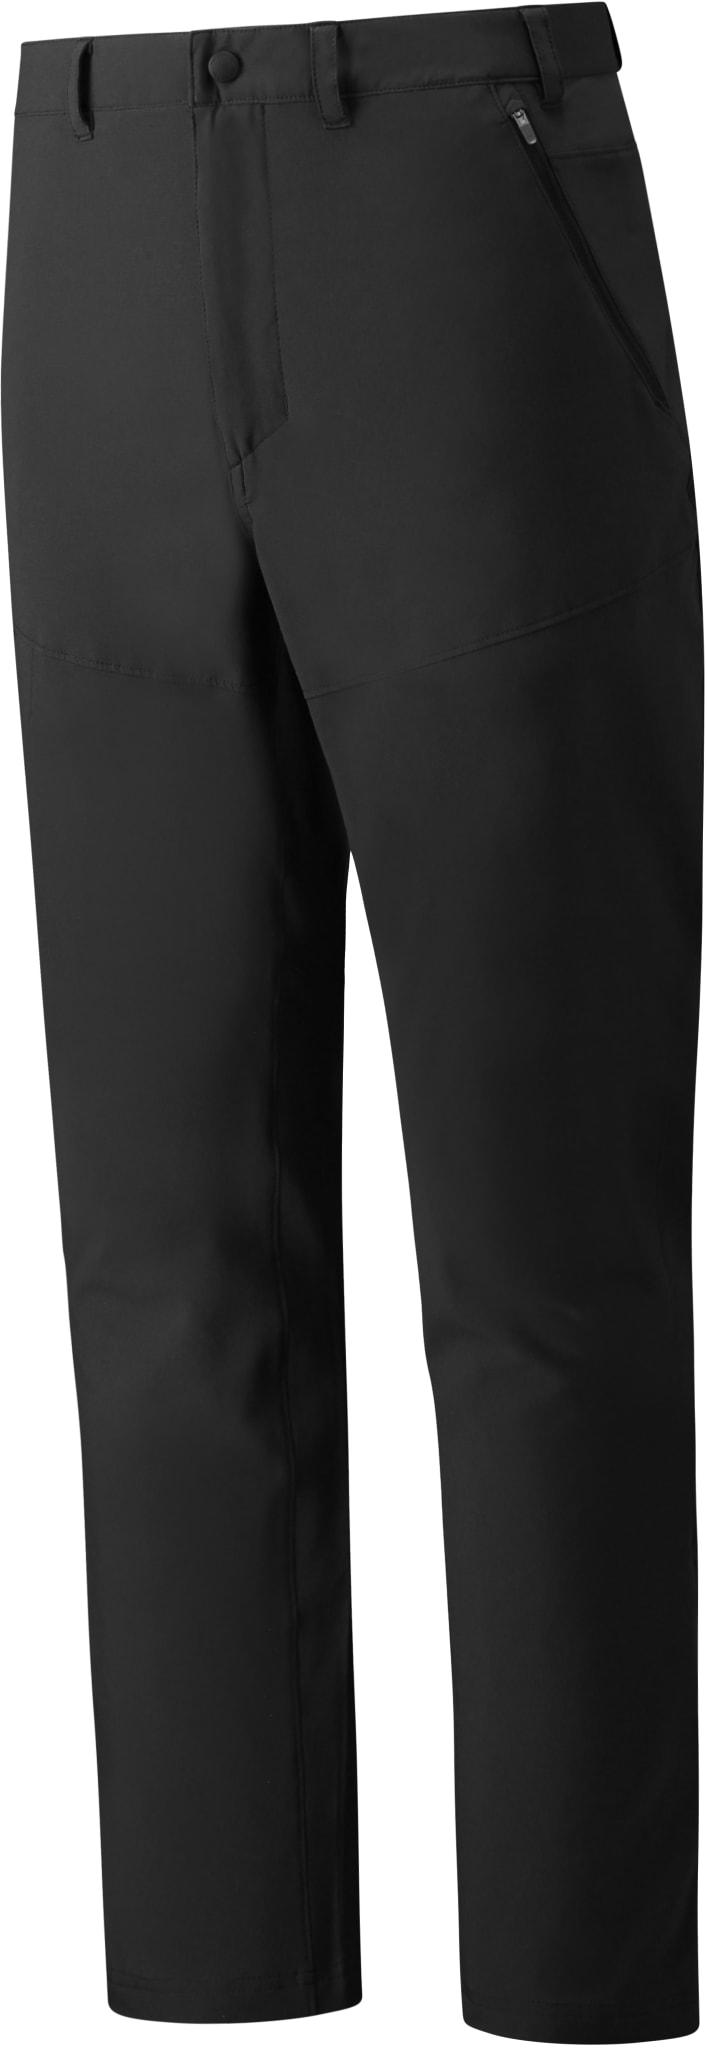 Altvia Trail Pants Regular Ms